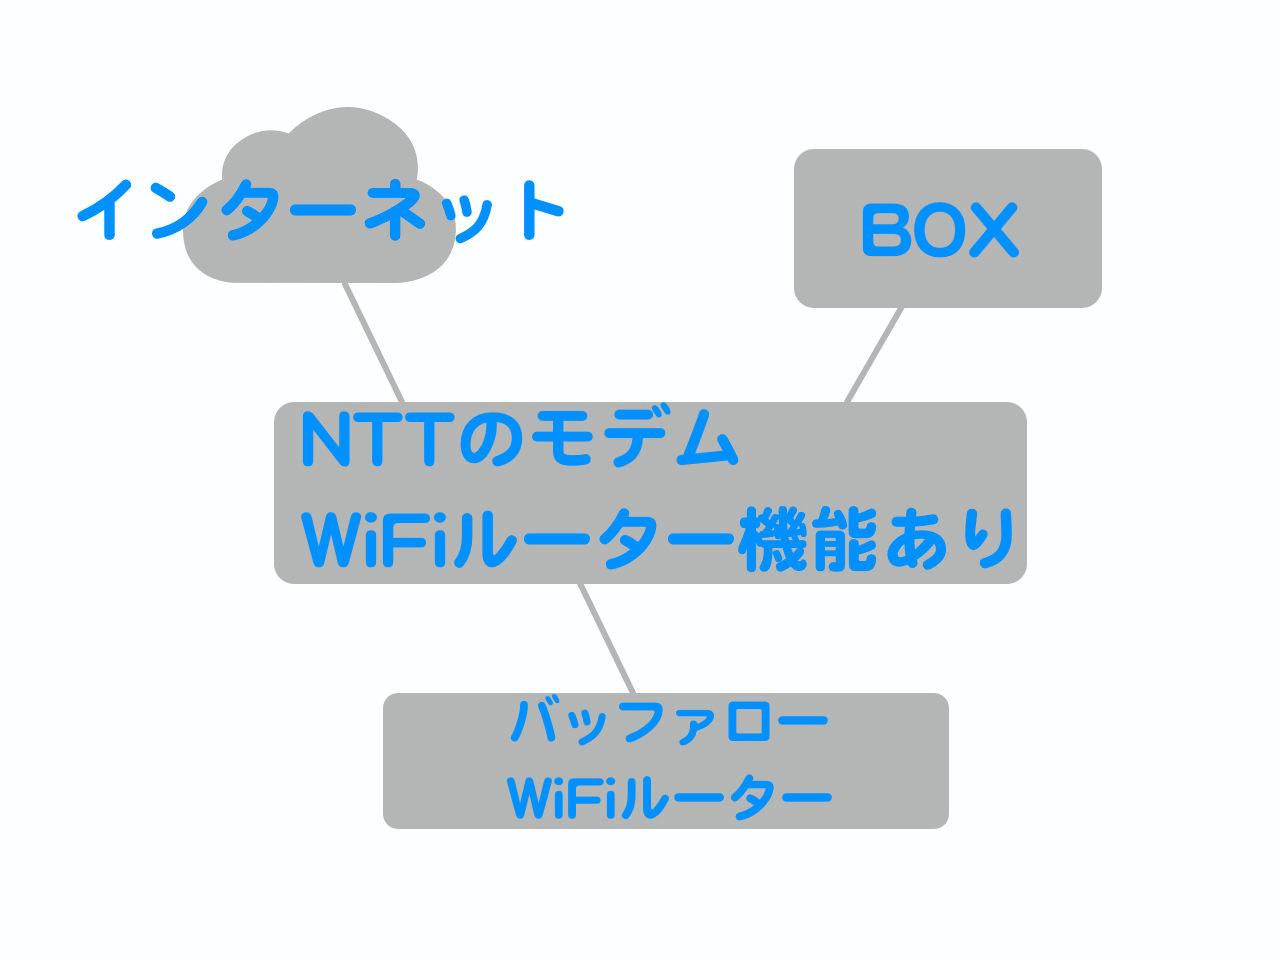 Bitdefender box 66566666t